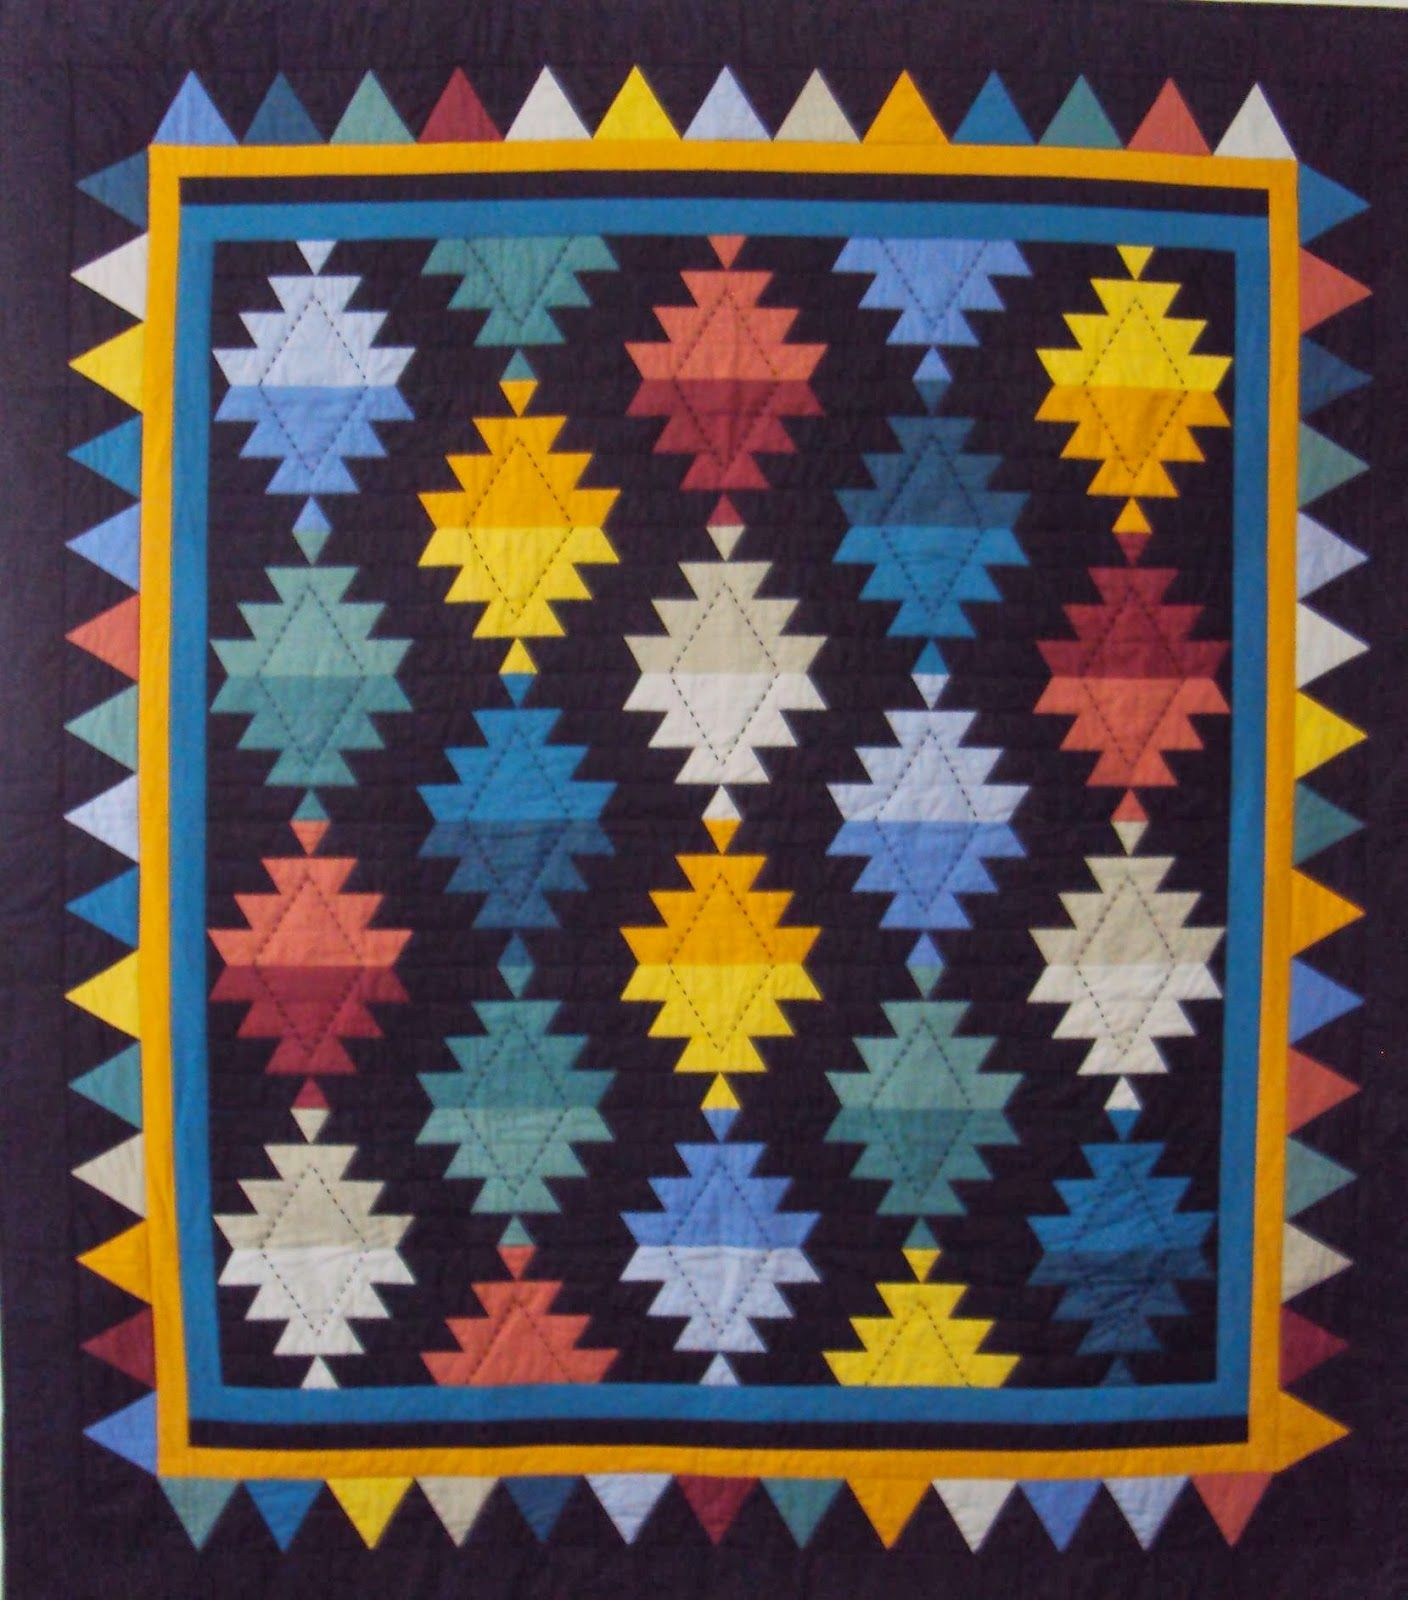 chinese lantern quilt patterns | KALEIDOSCOPE STARS Machinepiecing ... : chinese quilt patterns - Adamdwight.com